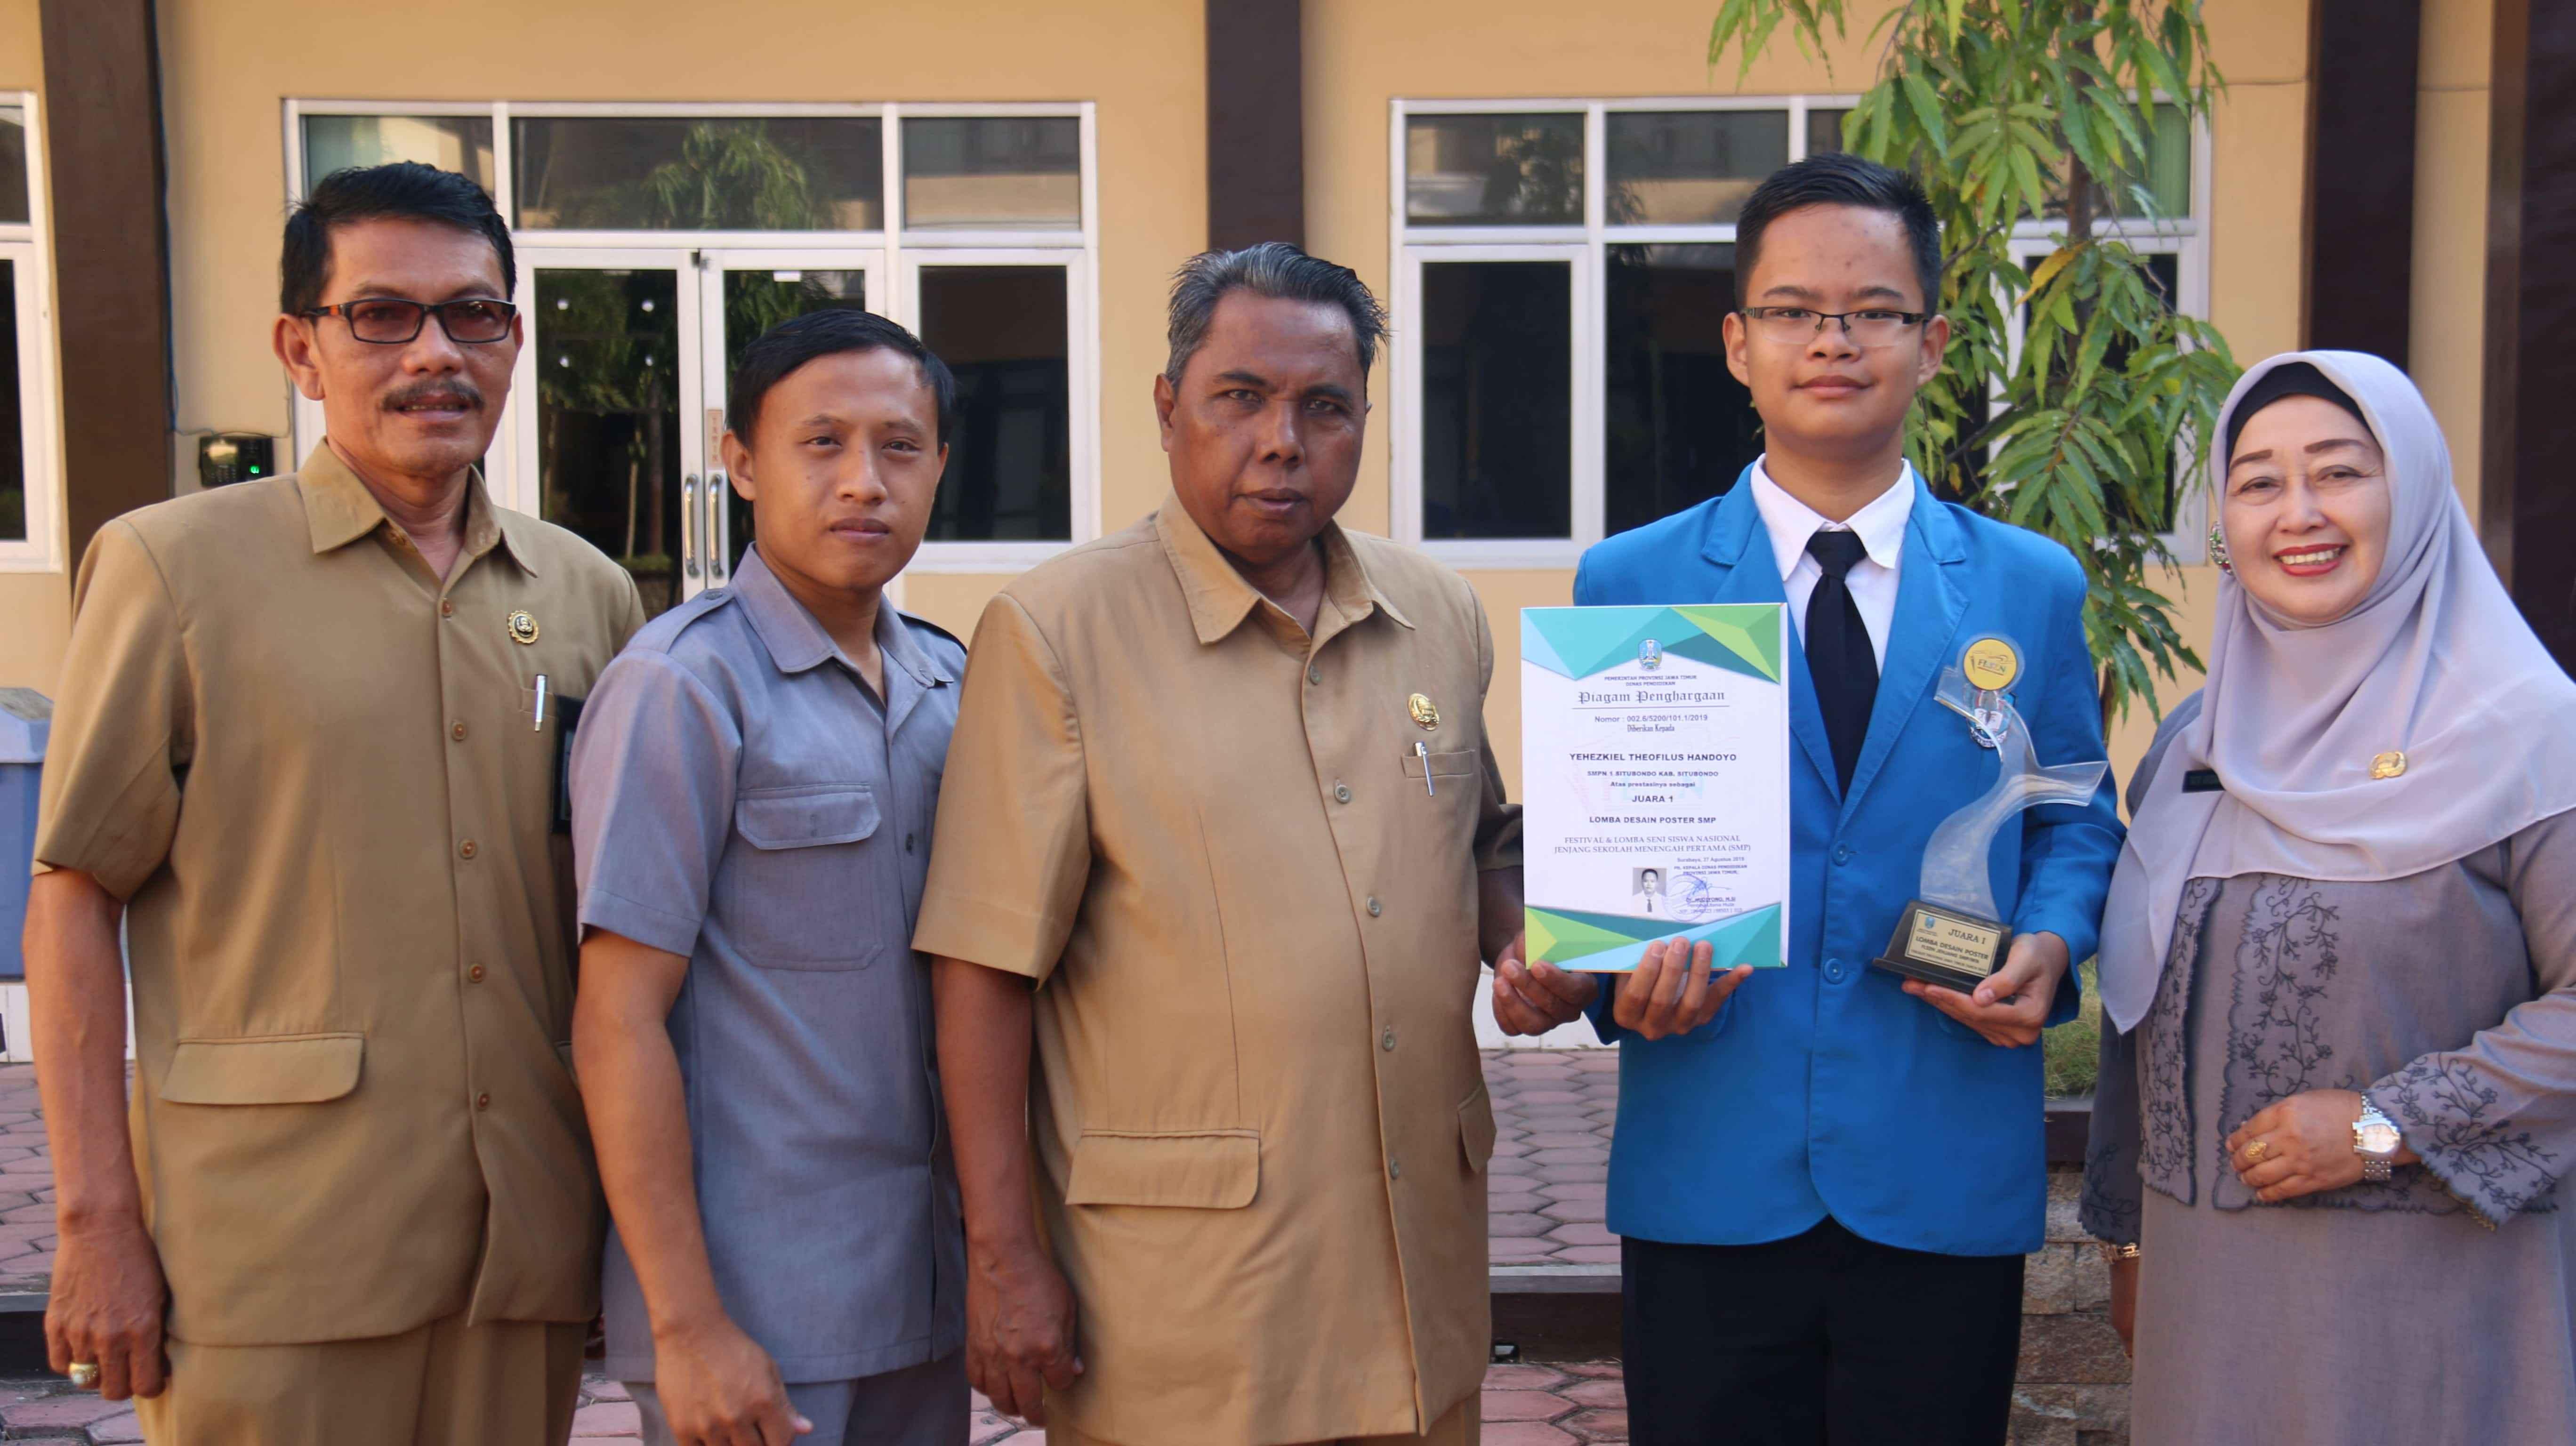 Kab. Situbondo mewakili Jawa TImur untuk FLS2N tingkat Nasional